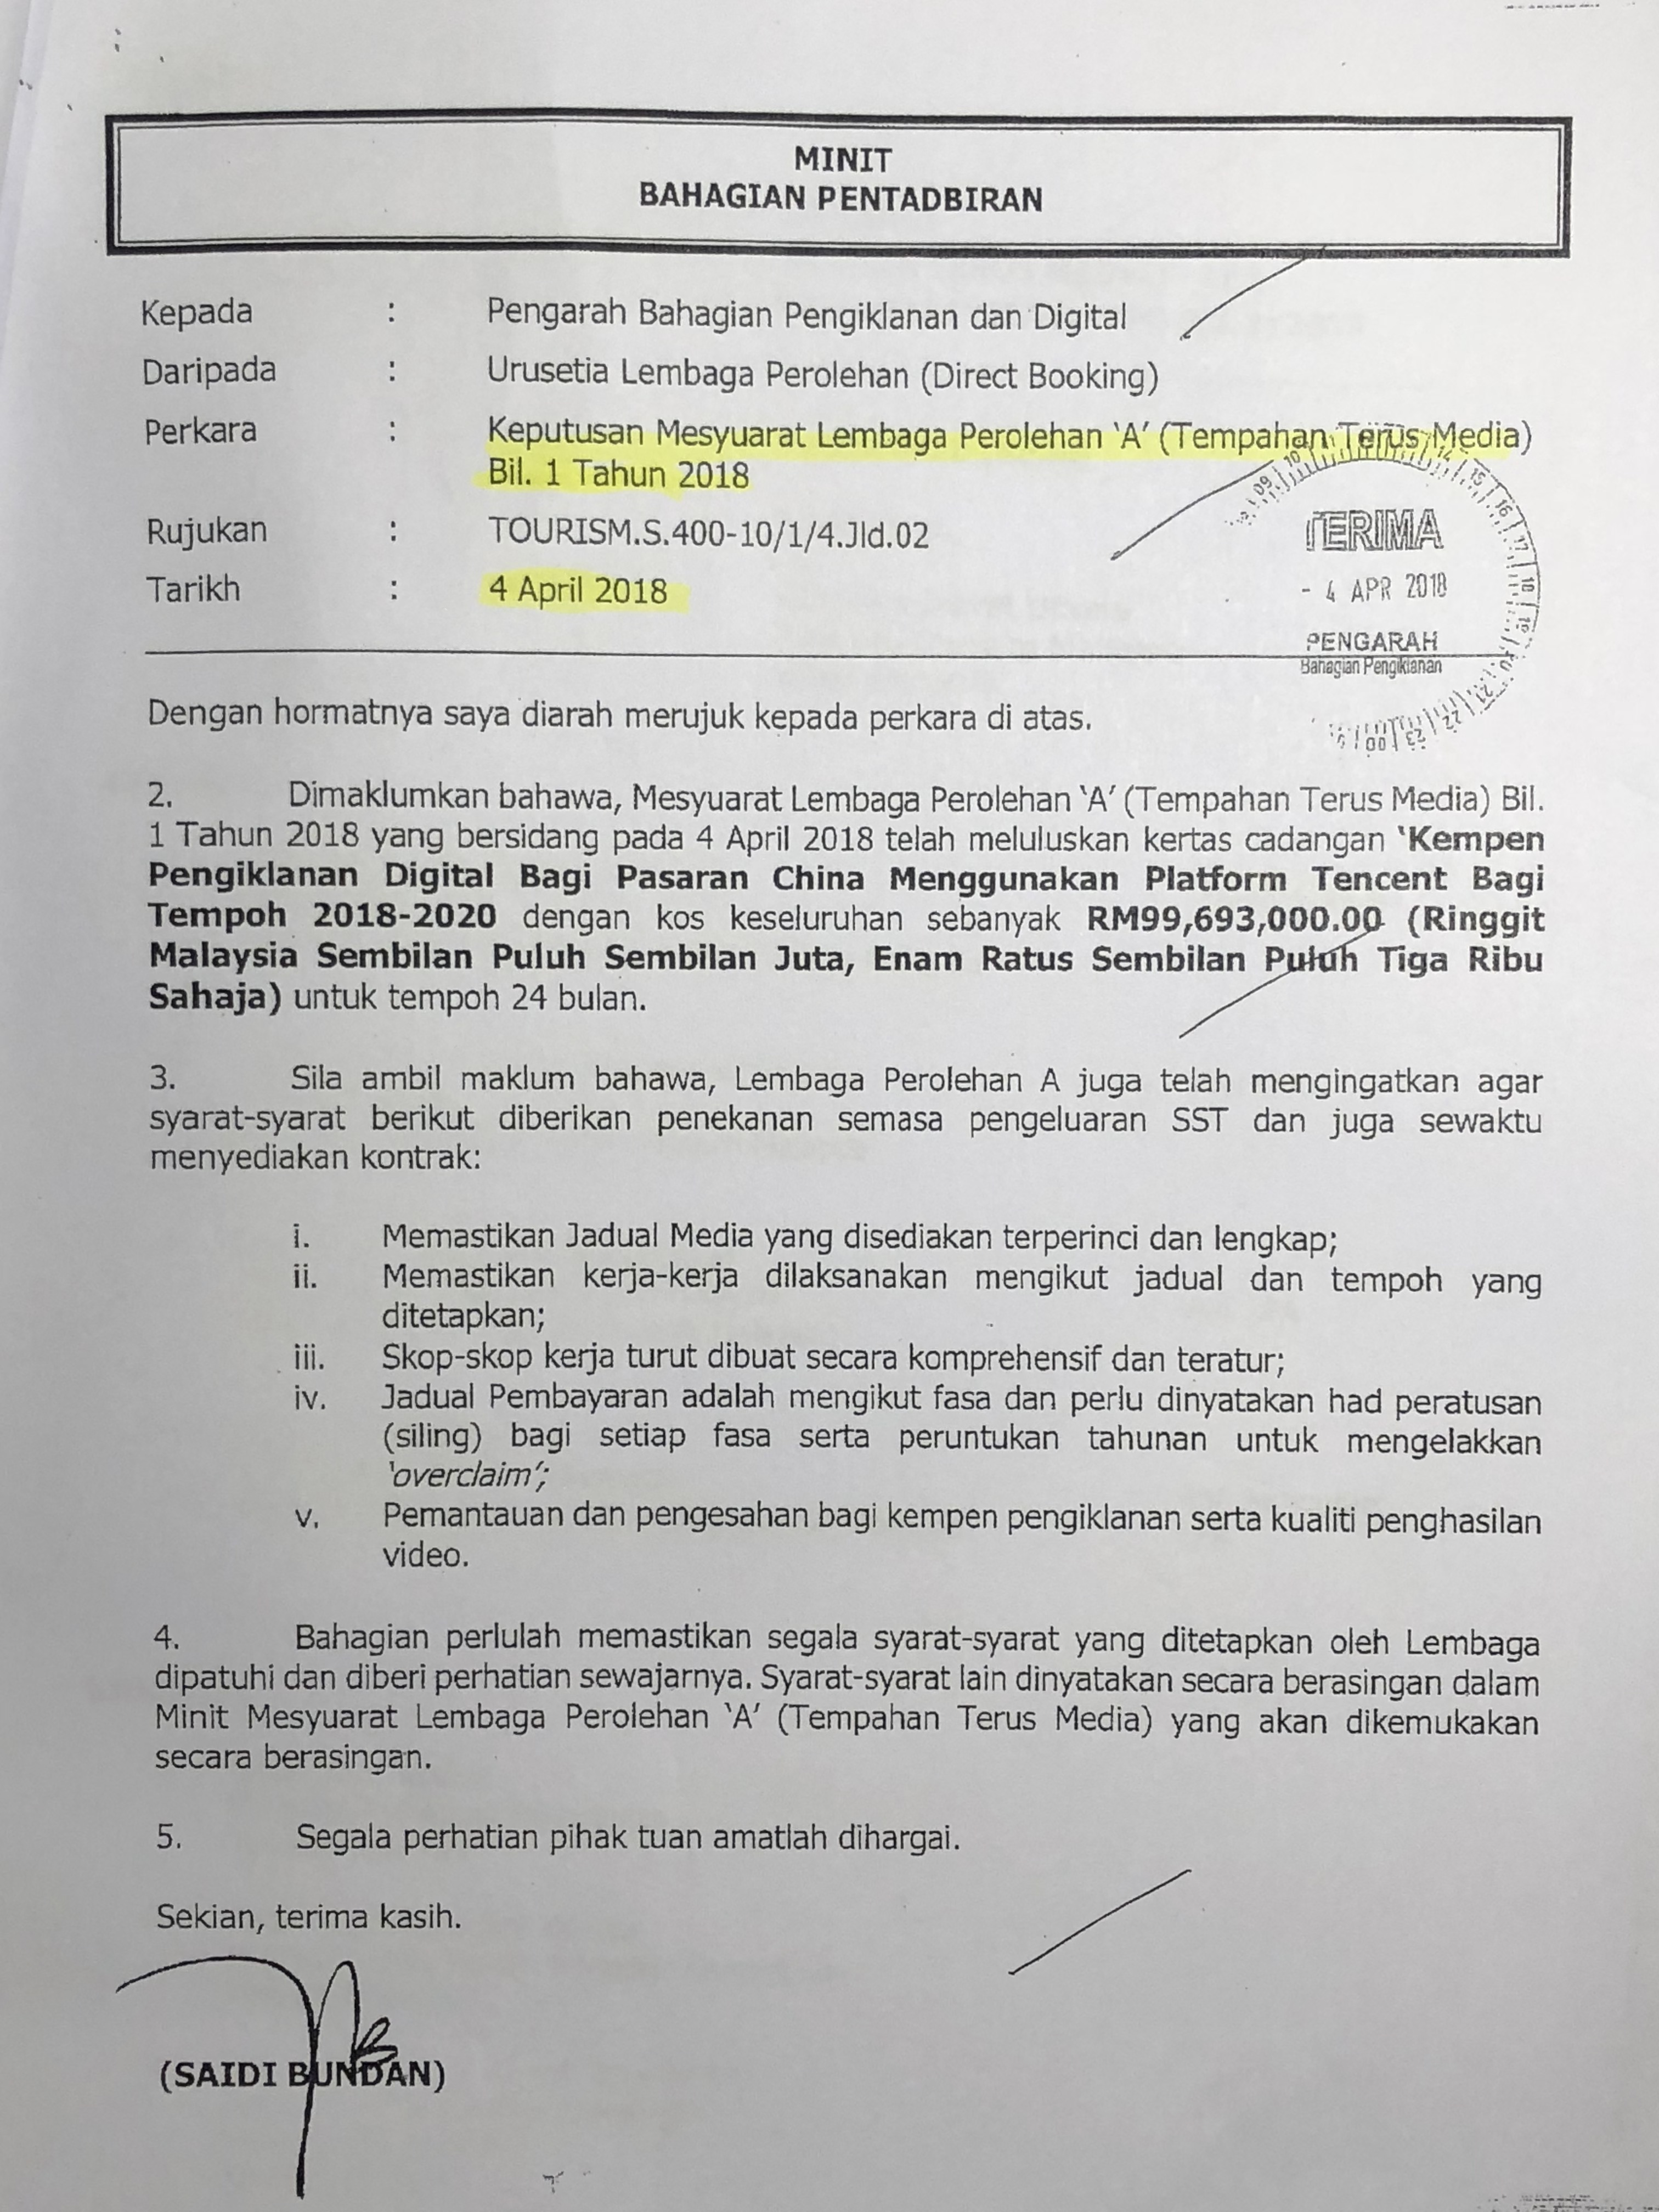 Summary Of Tourism Msias Rm99693 Million Speedy Gonzales Geeko Deal Ringgit Malaysia 4 2018 Memo From Bahagian Pentadbiran Tm